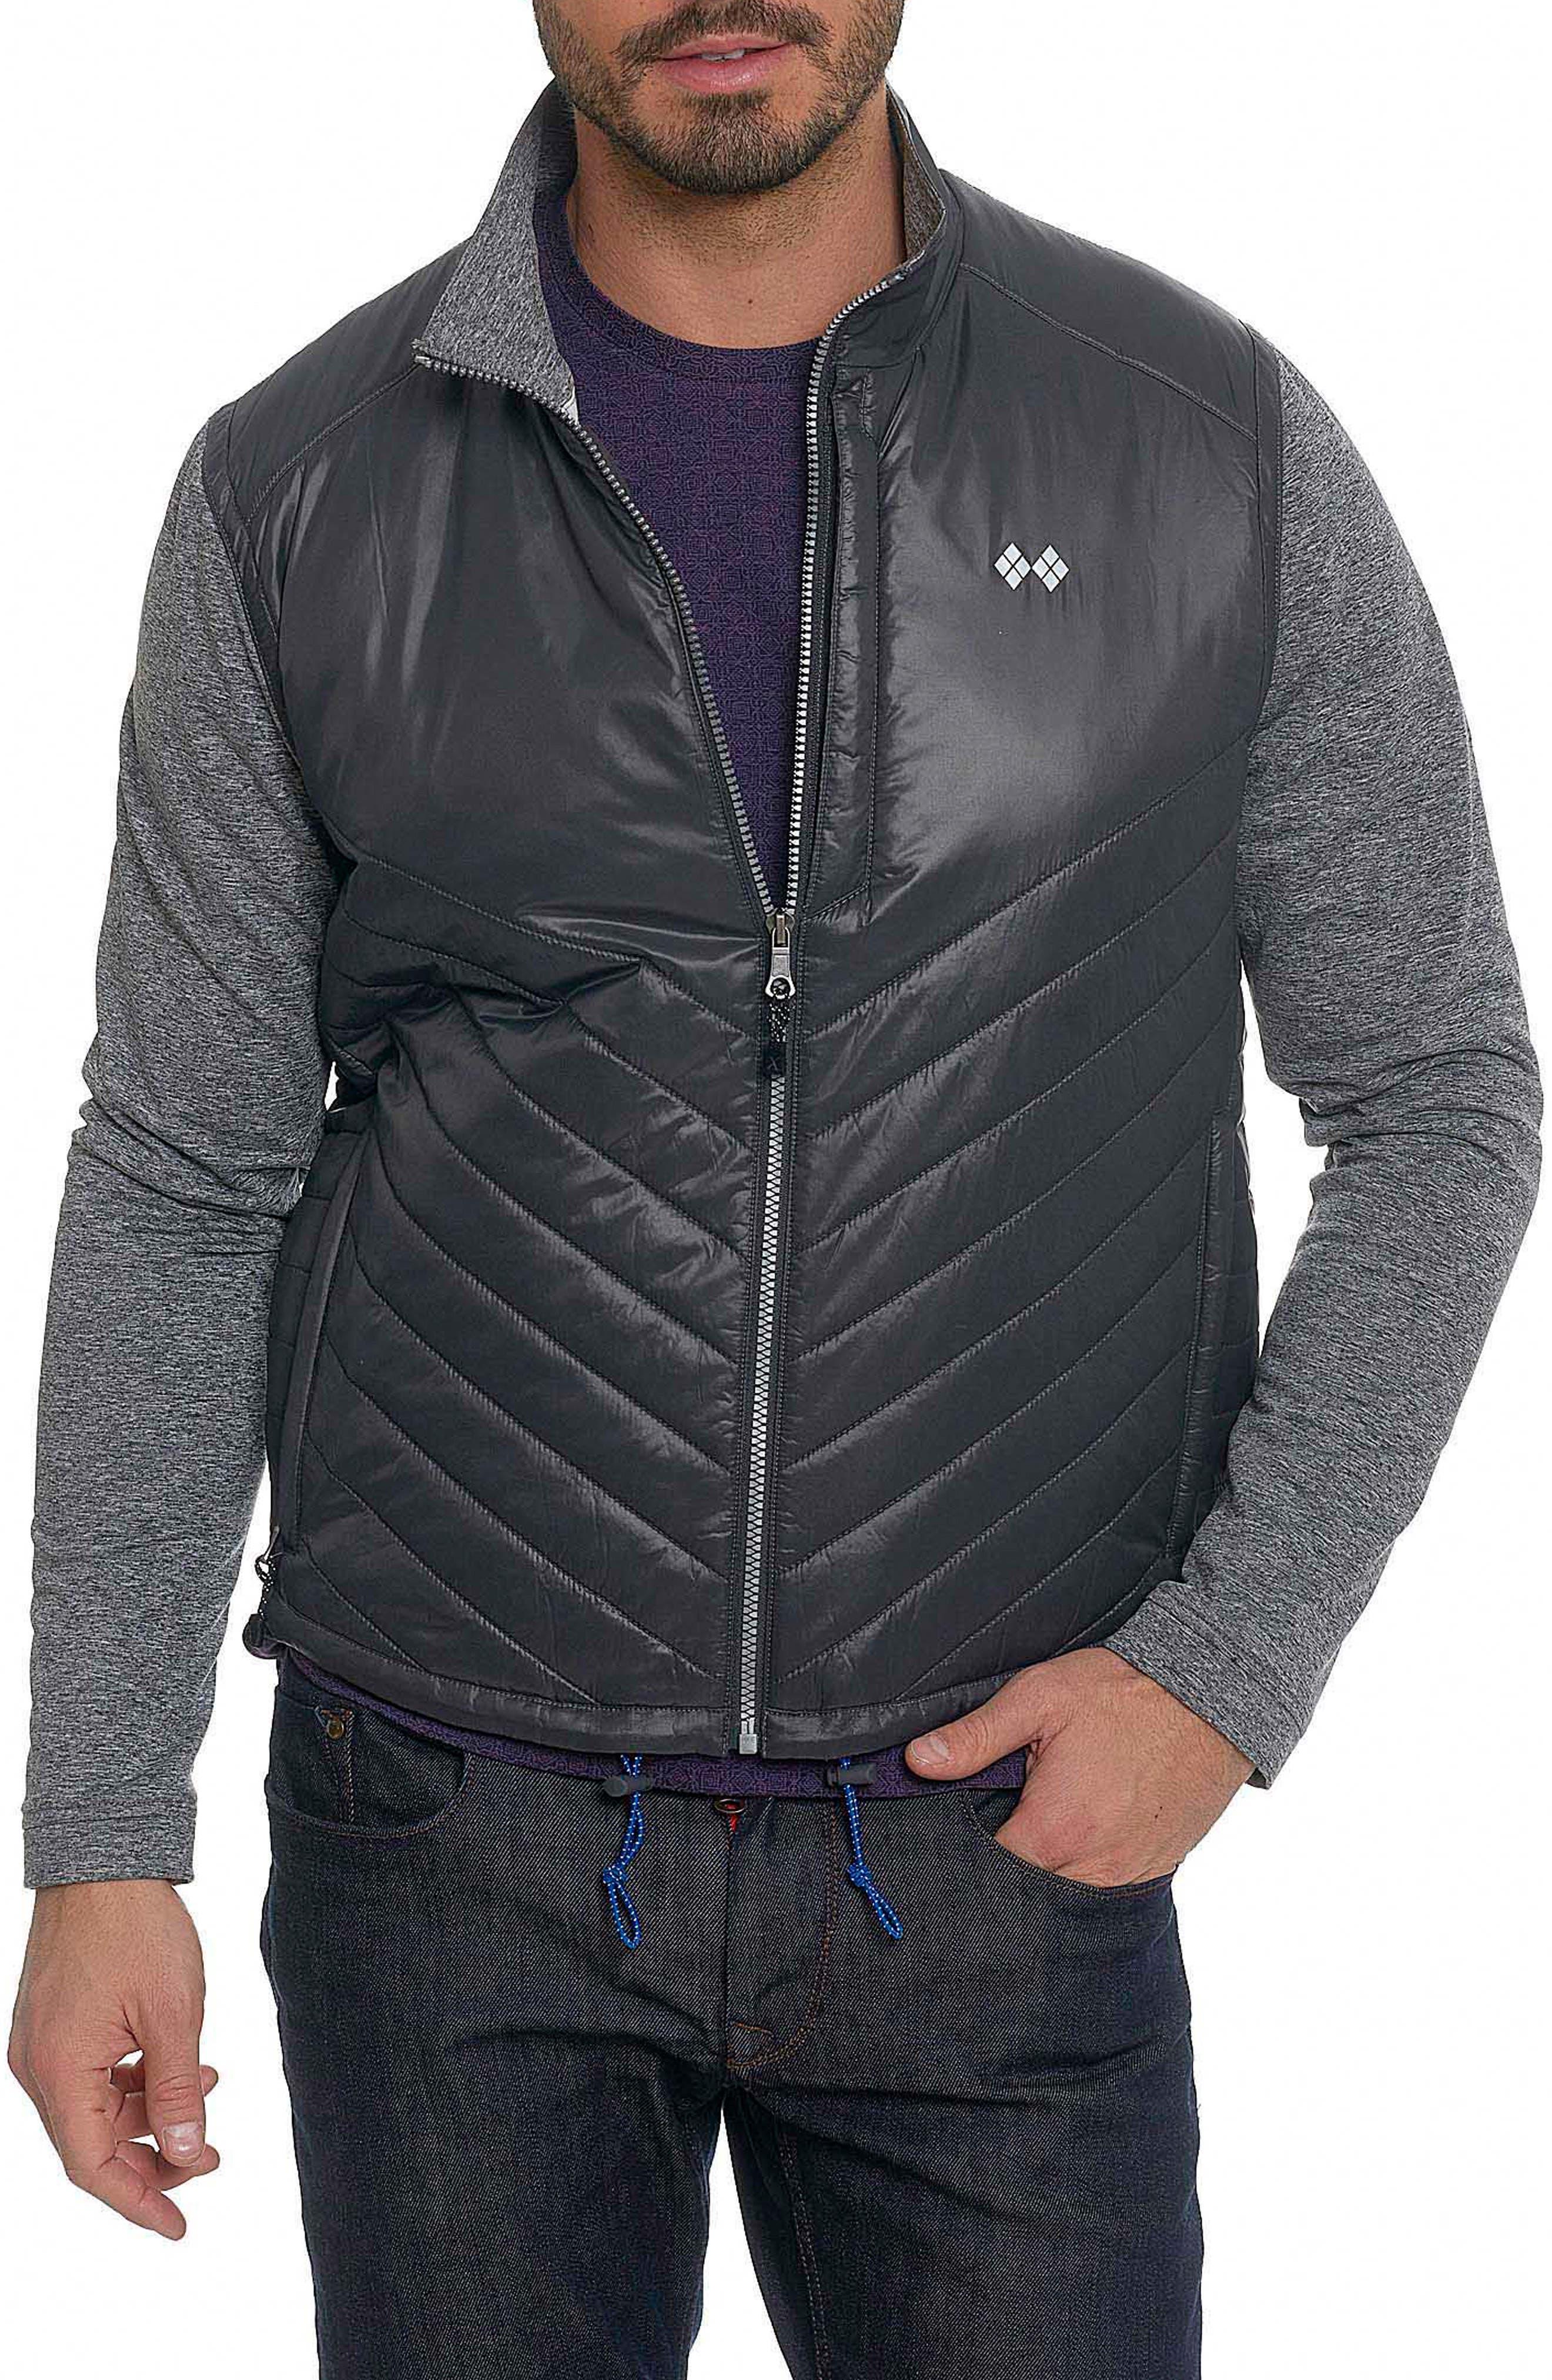 Main Image - Robert Graham Poconos Tailored Fit Mixed Media Jacket